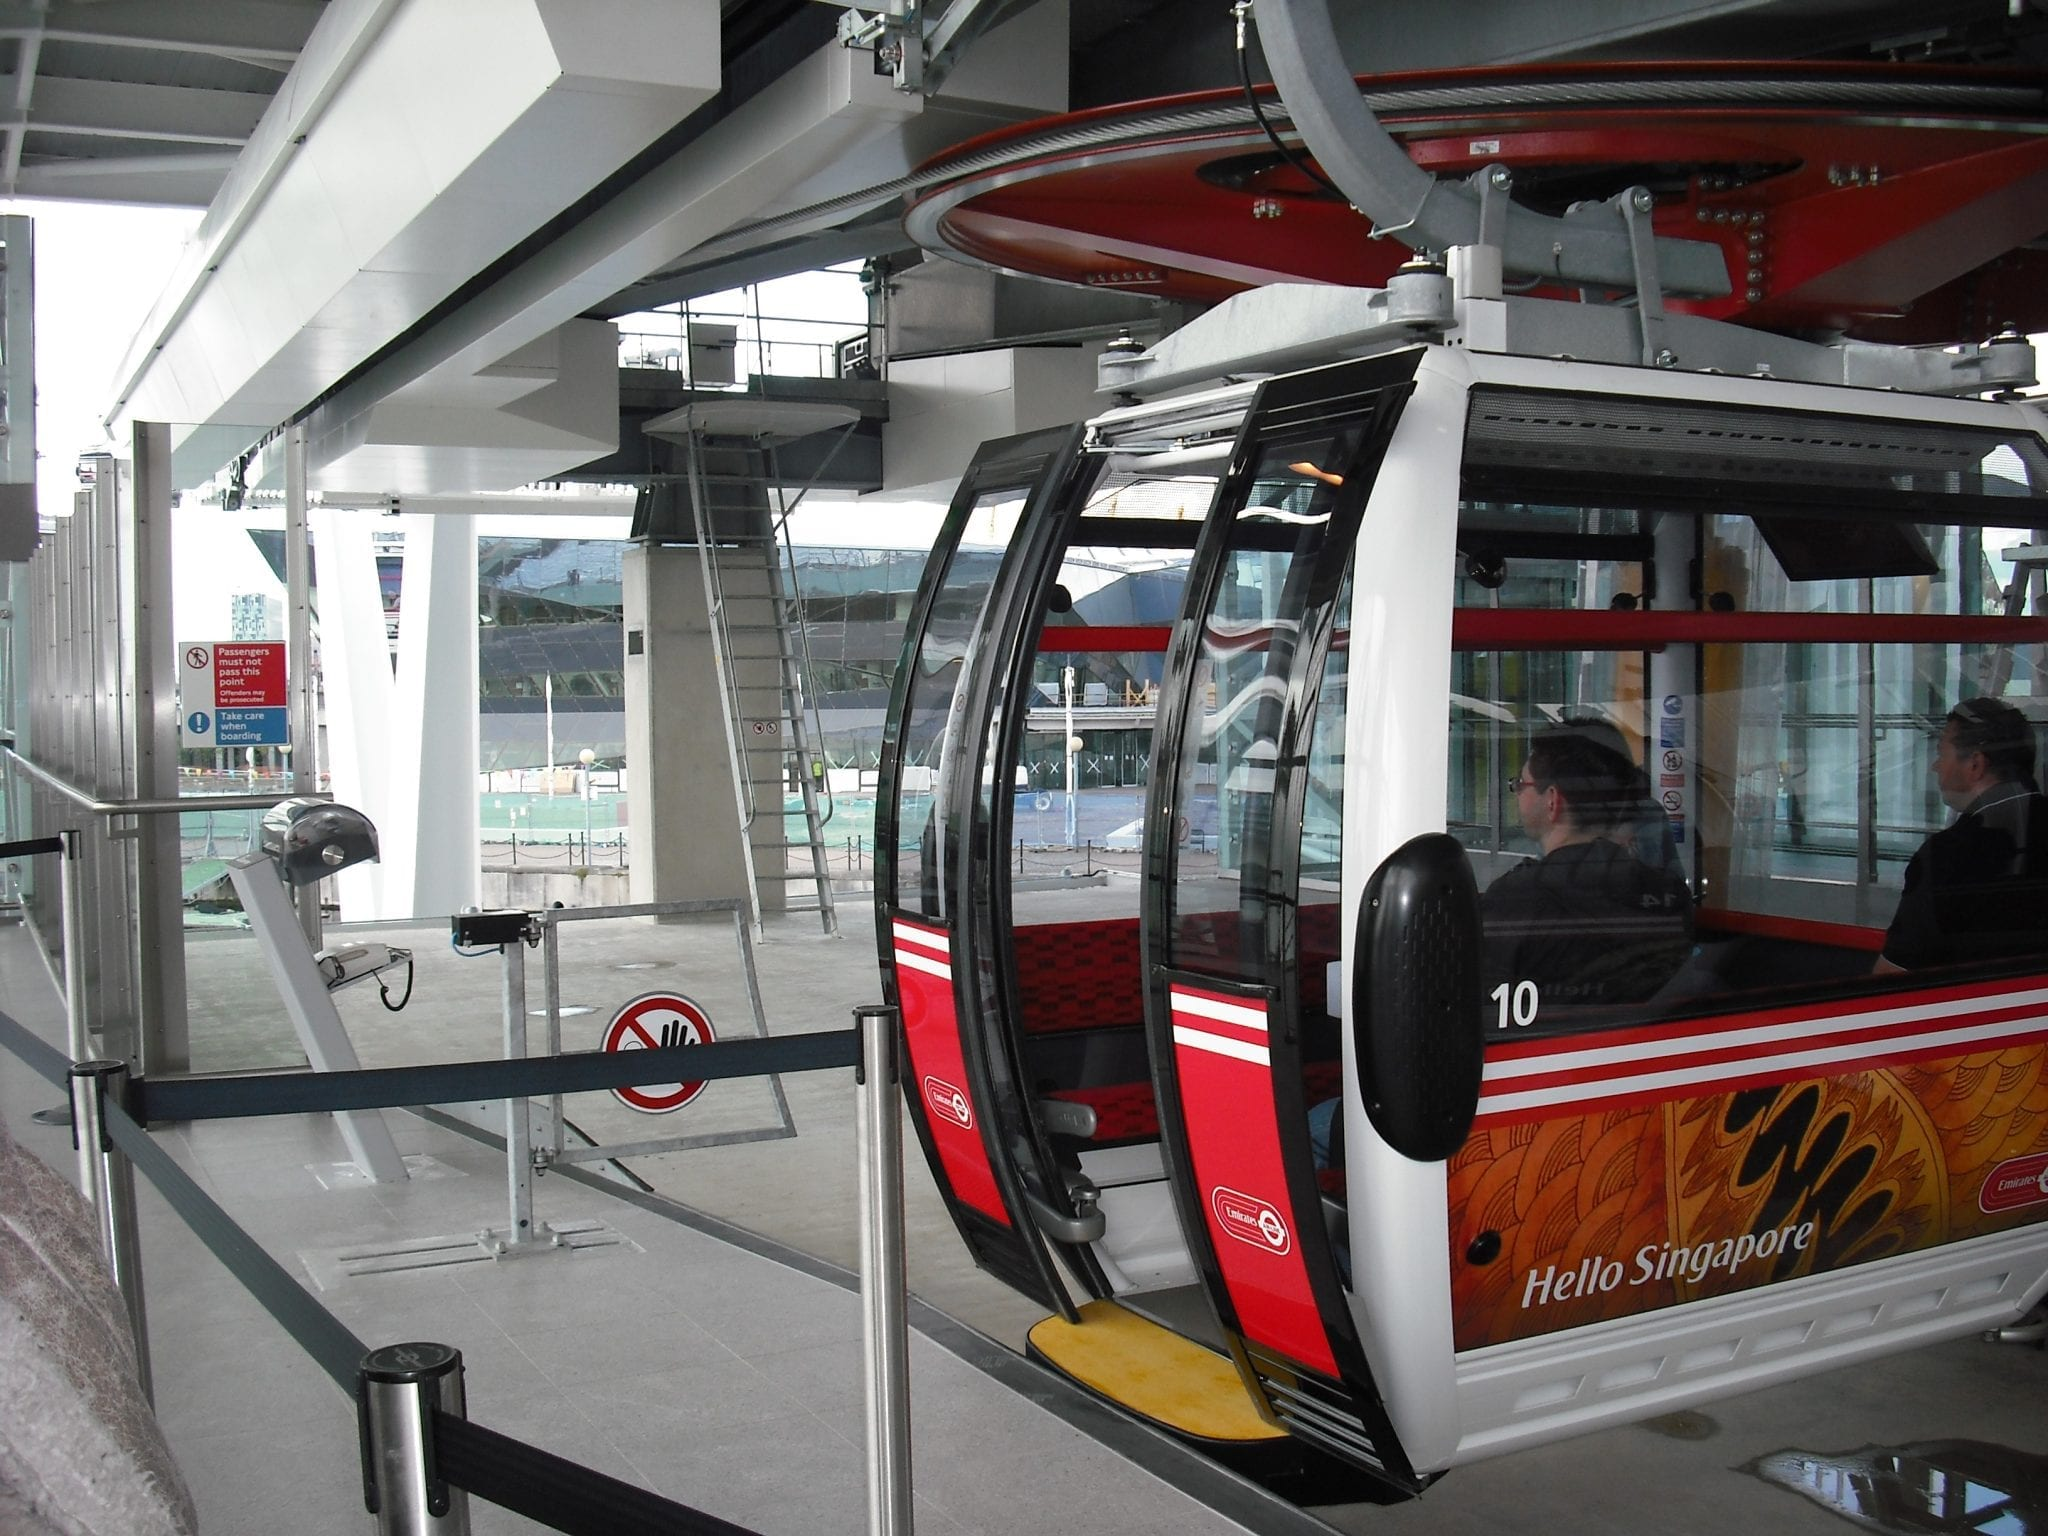 Royal Docks Station para tomar el teleférico emirates